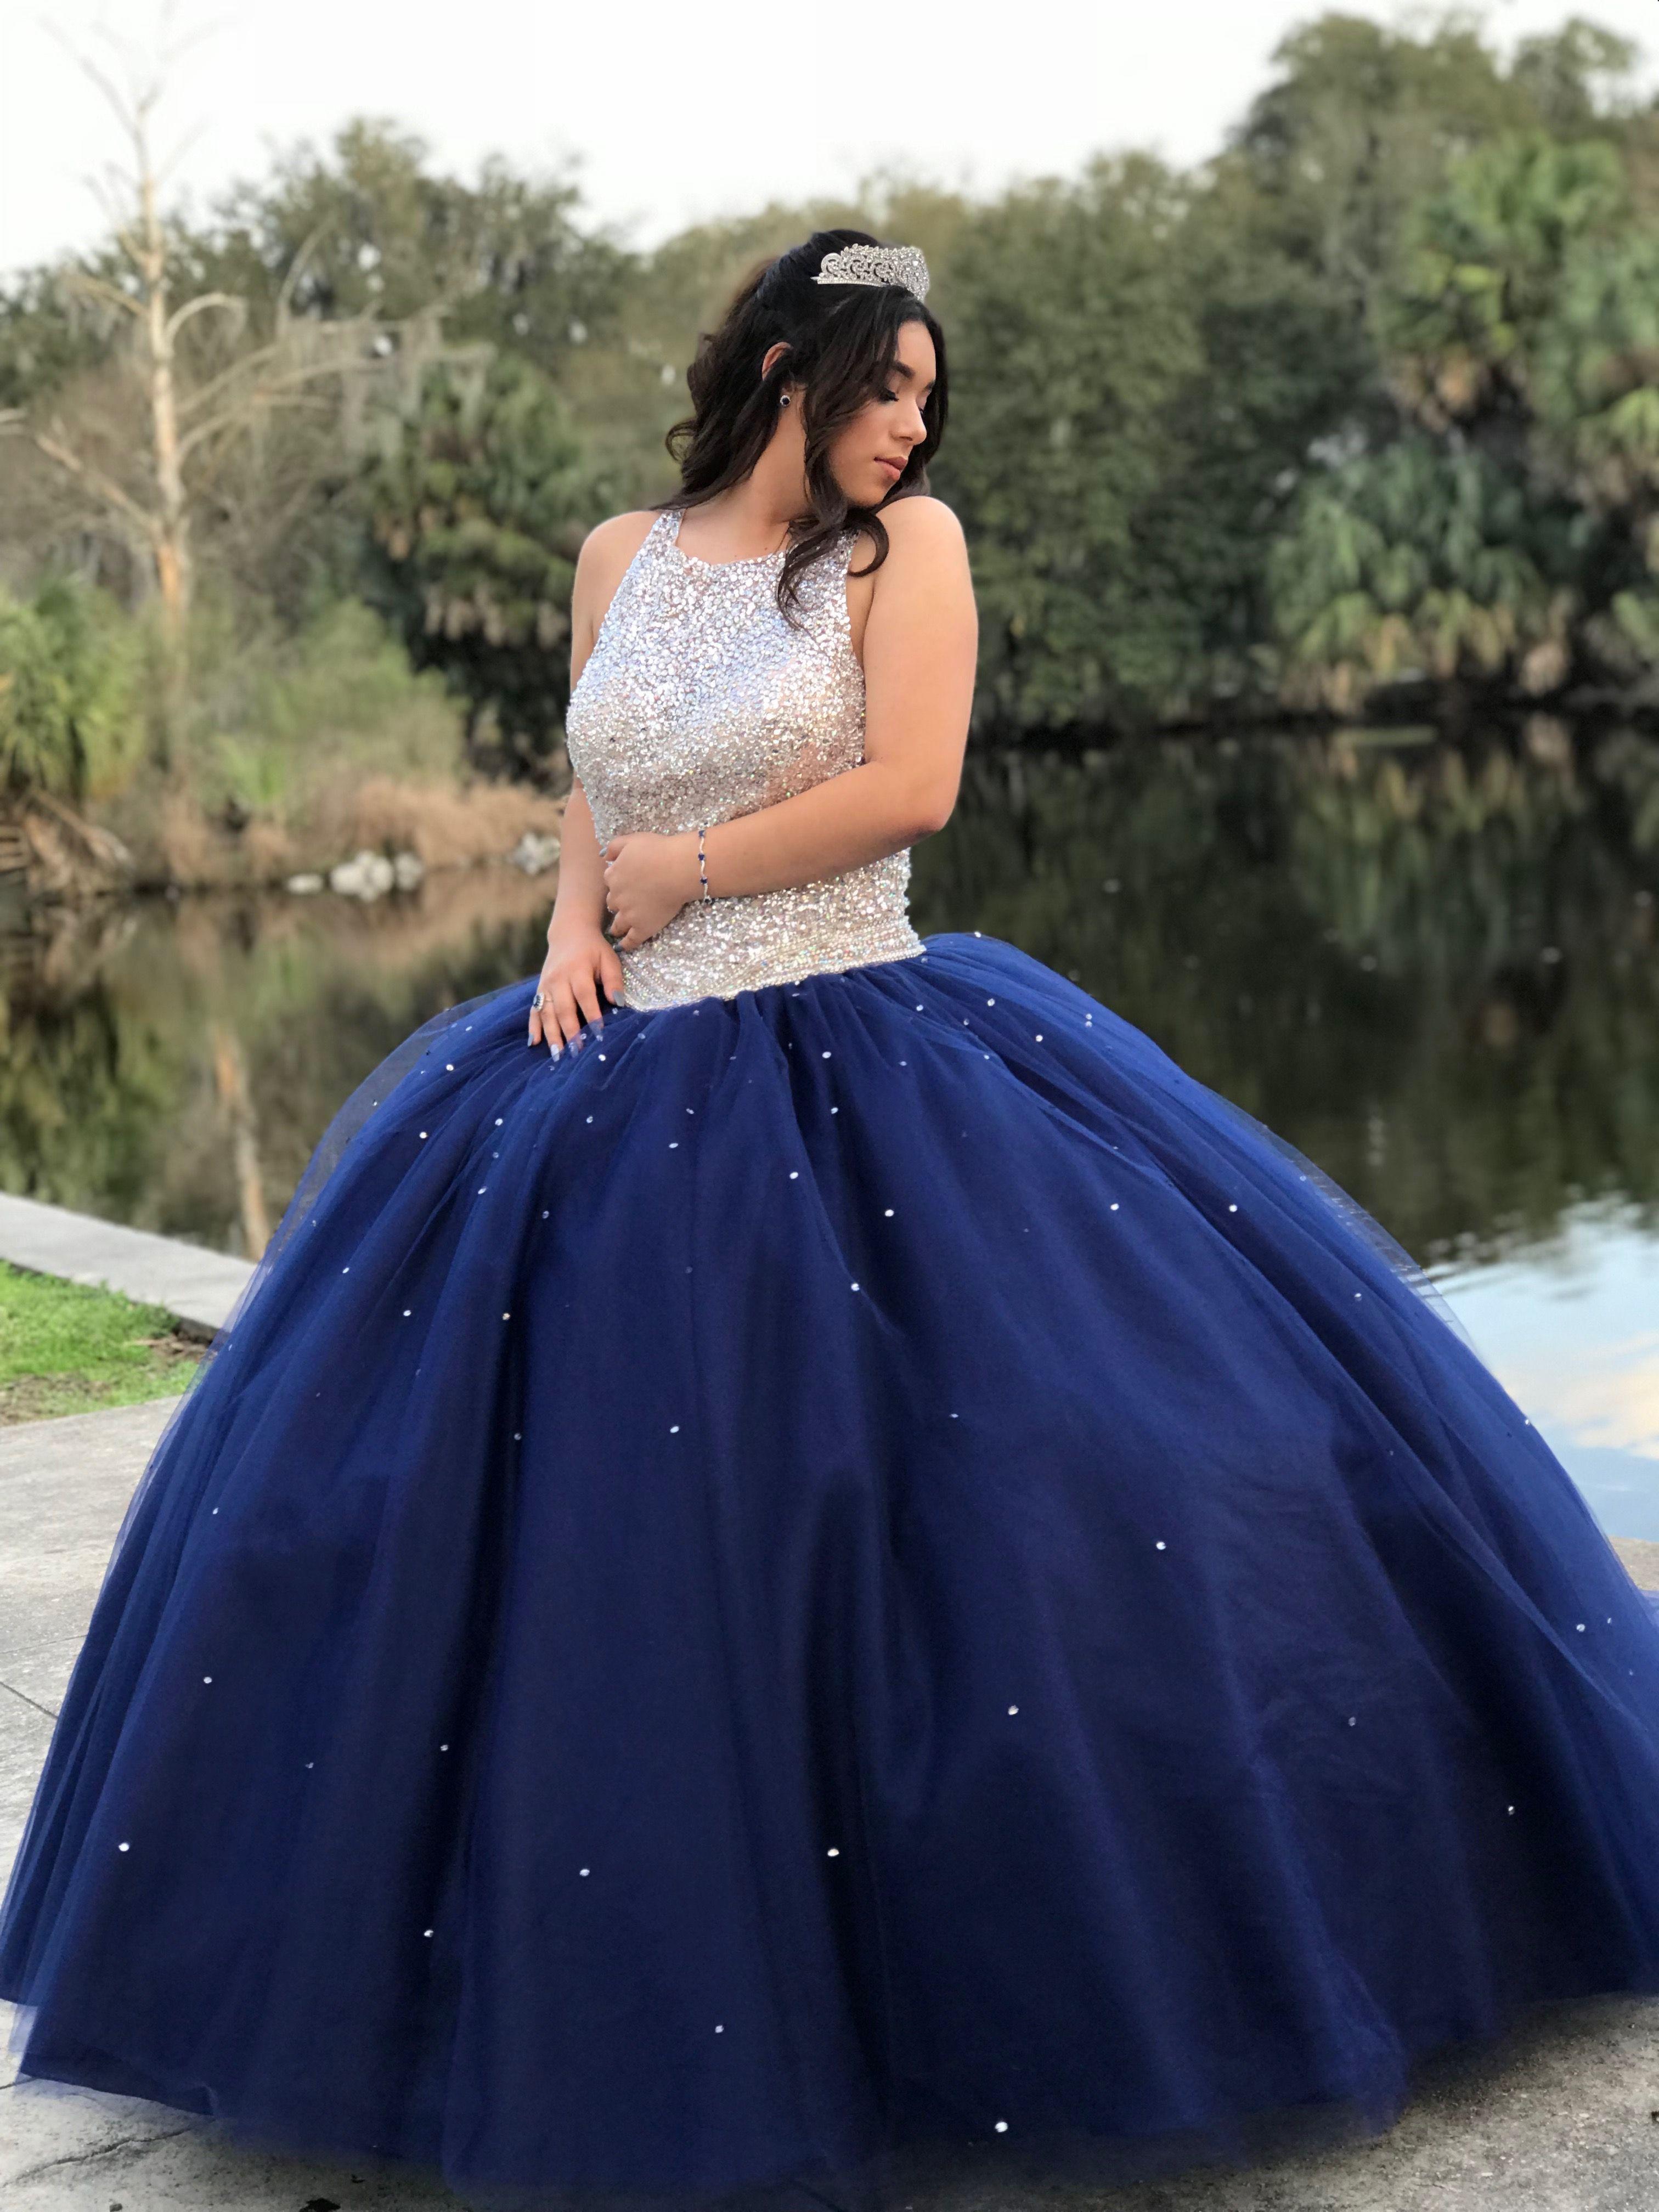 Royal Blue Quinceanera Dresses Sweet 16 Ball Gowns Quinceanera Dresses Blue Elegant Prom Dresses Quince Dresses [ 4032 x 3024 Pixel ]